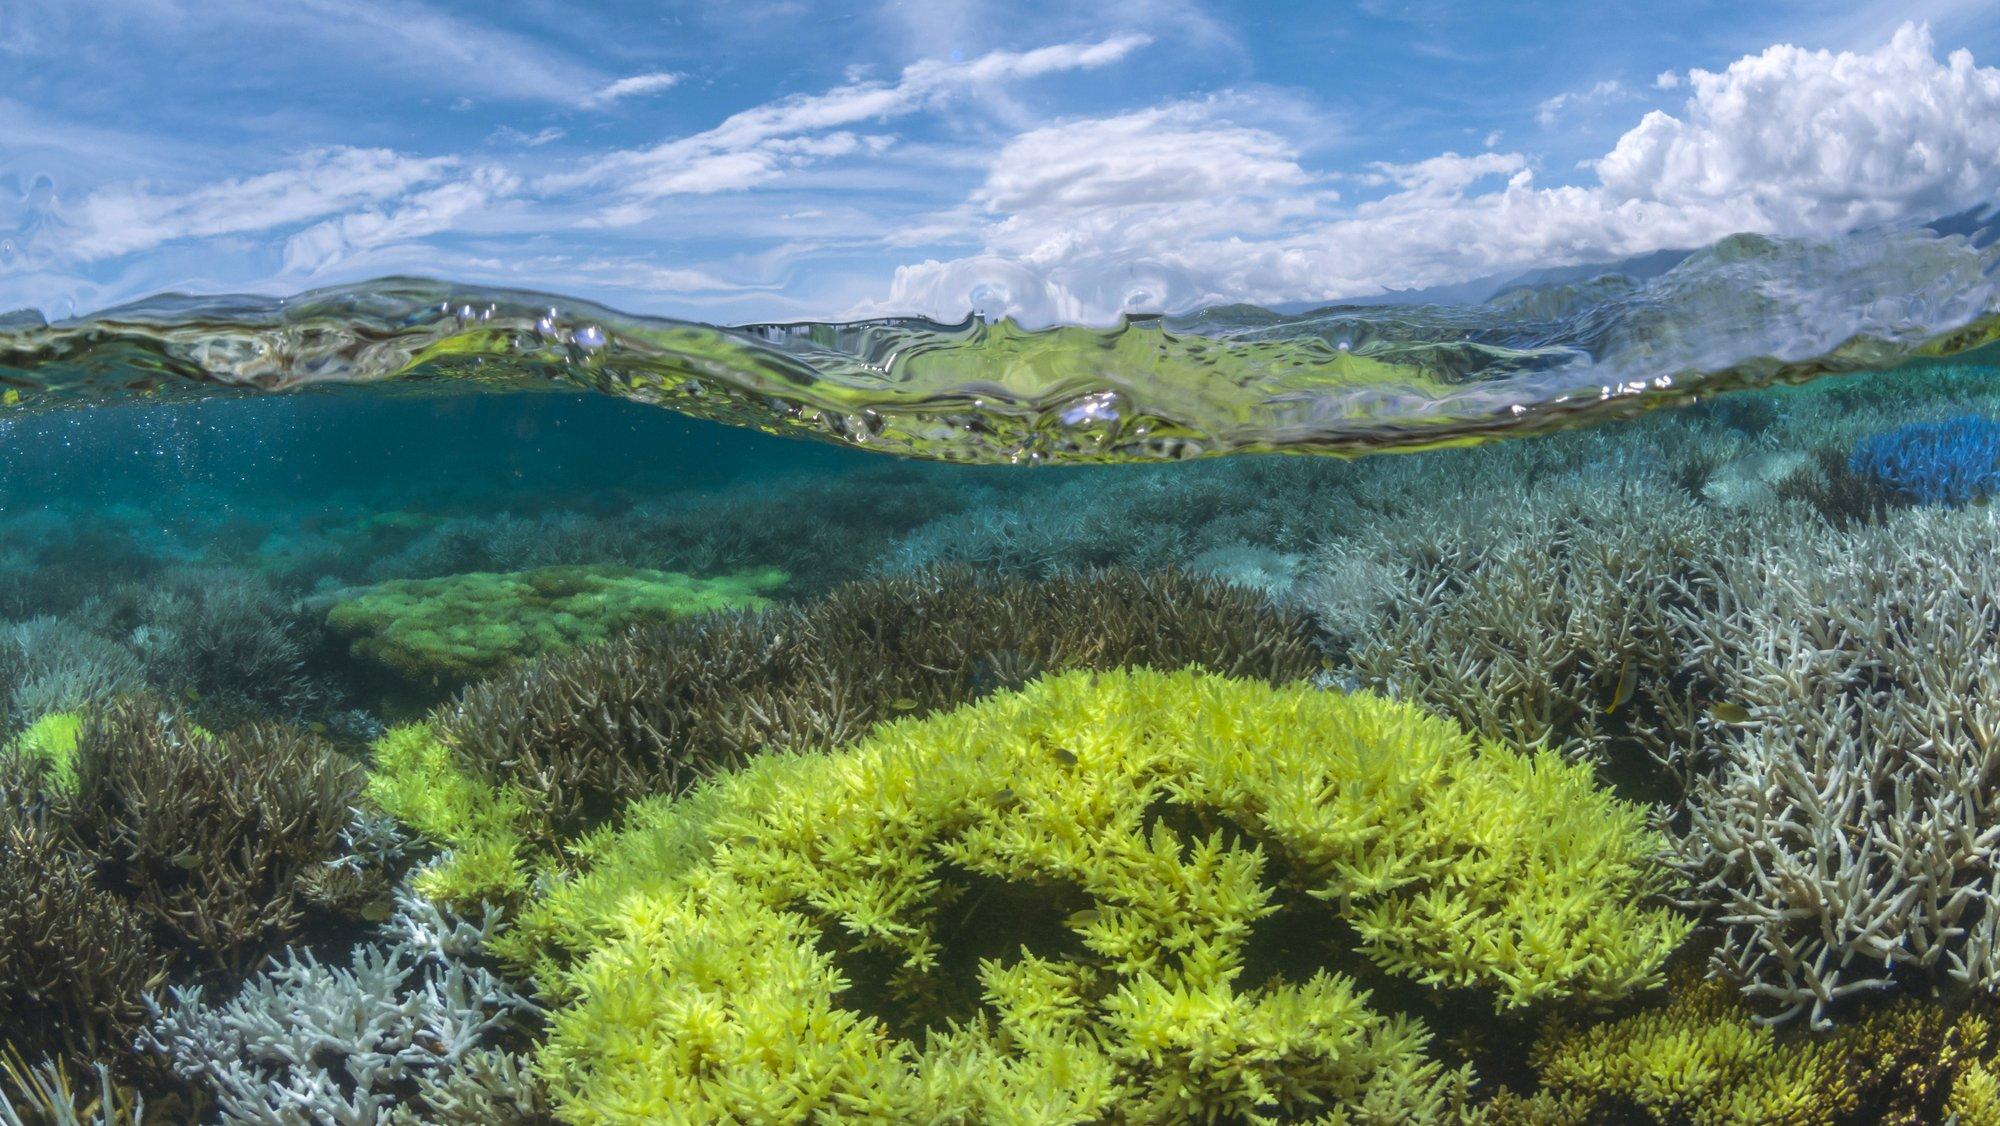 Google Keyword Chasing Coral Image 004.jpg